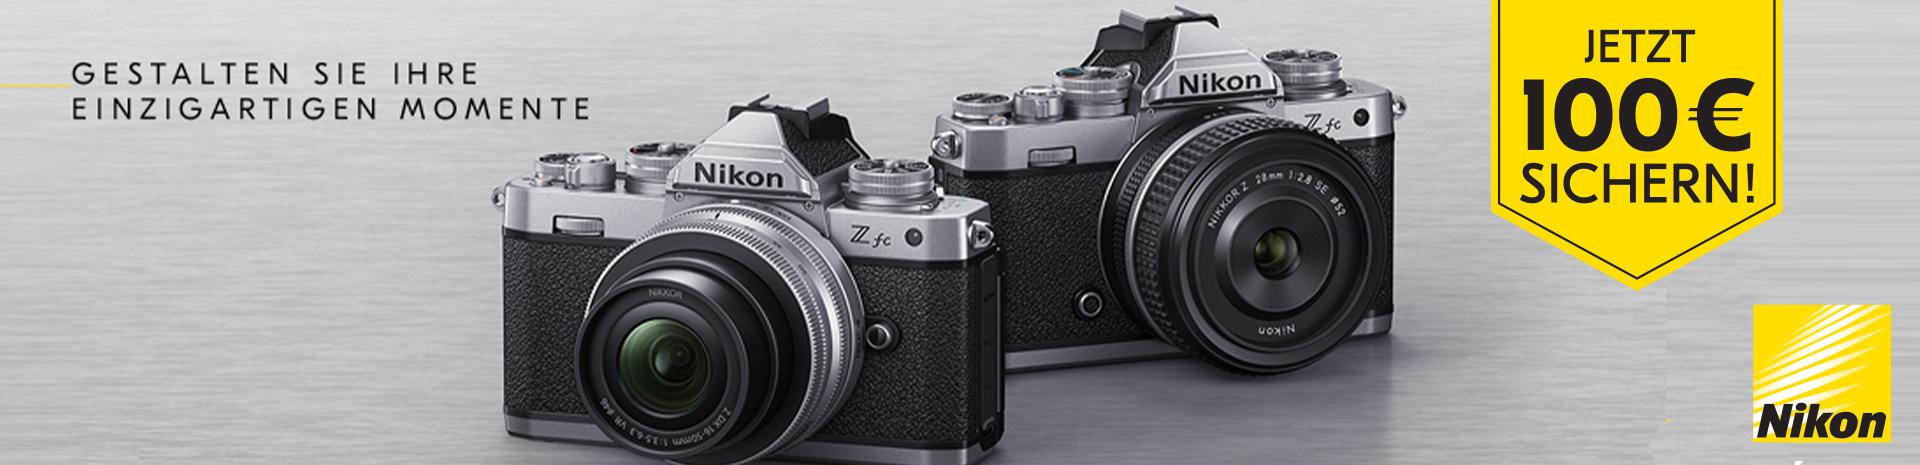 Nikon Objektiv Sofortrabatt